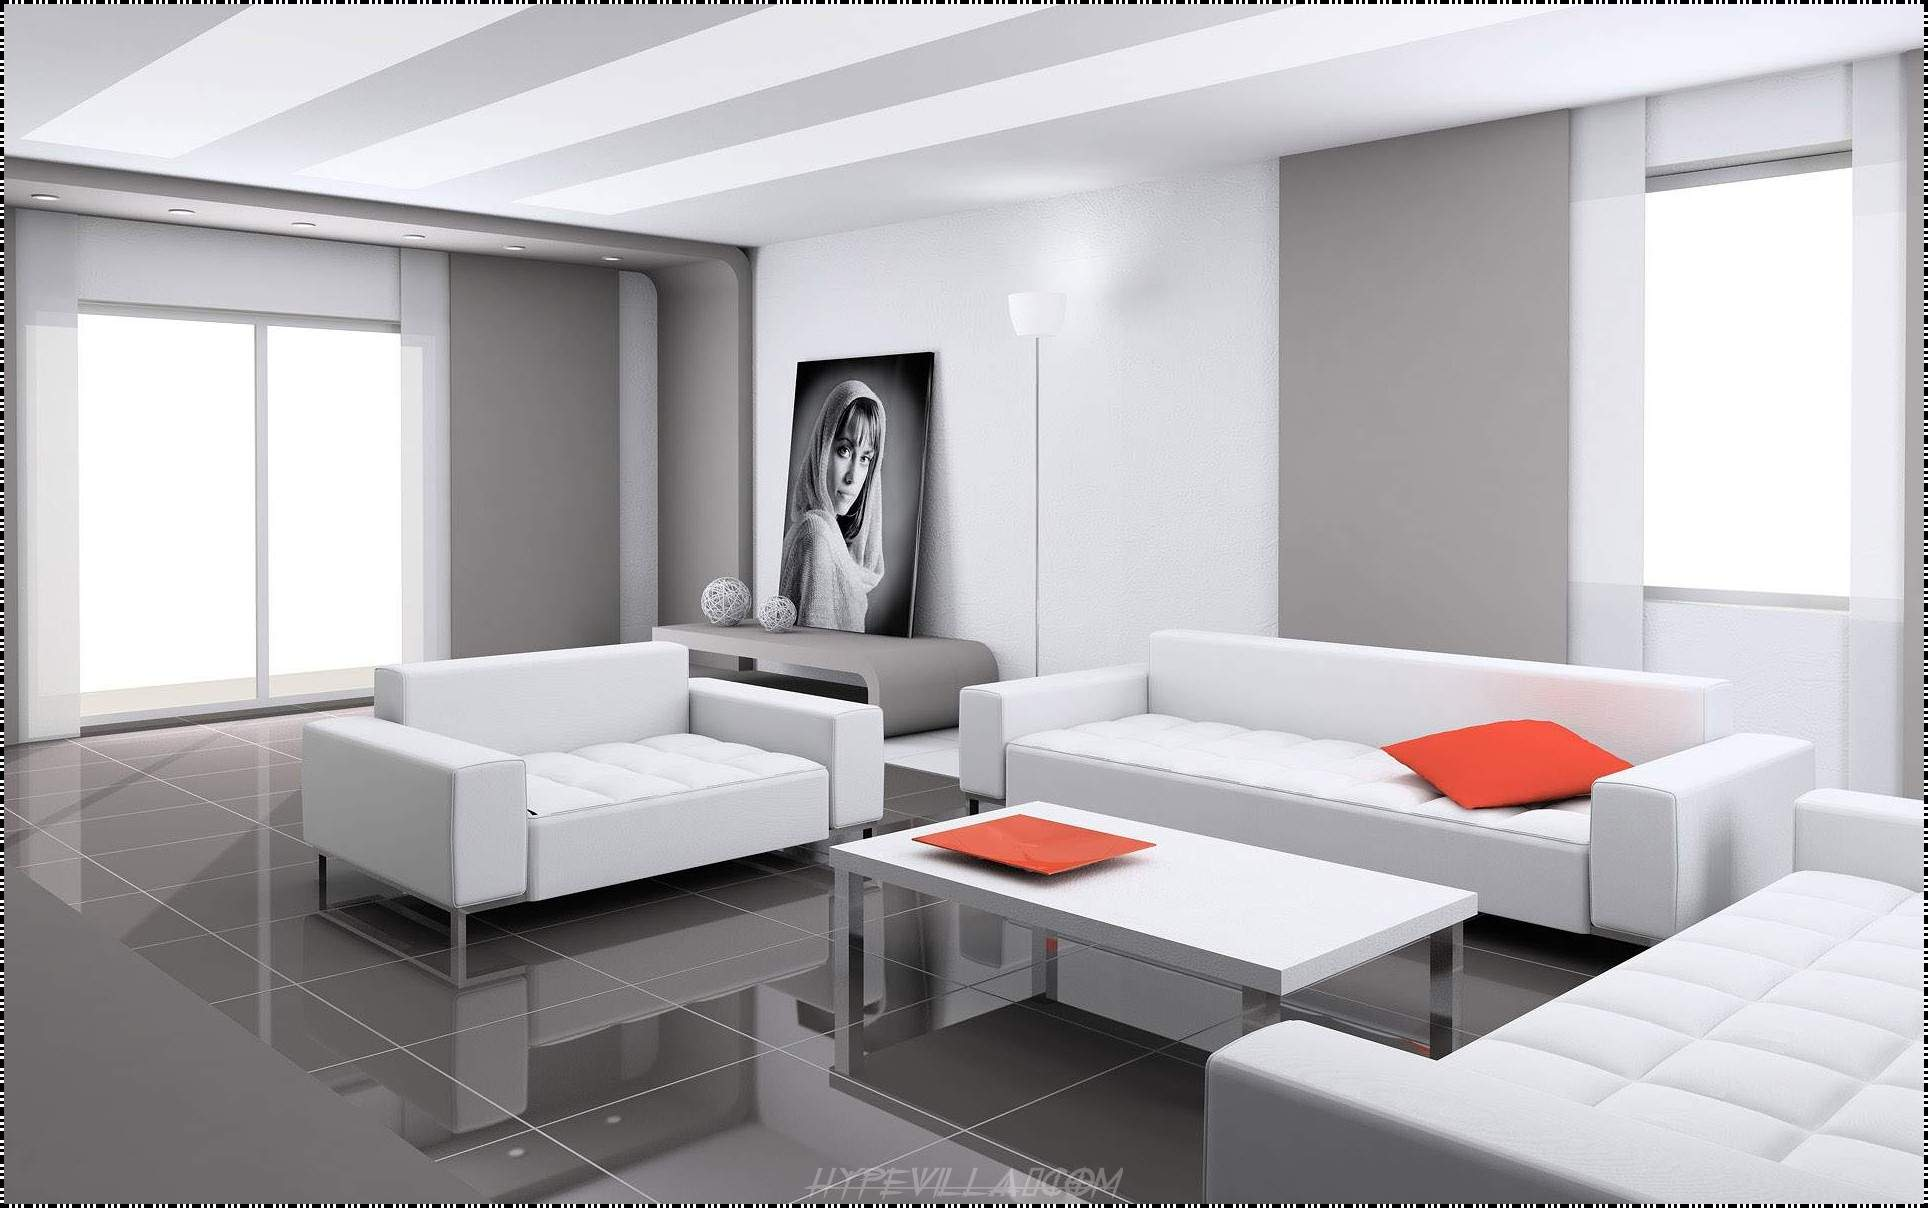 Living Room Stylish Living Rooms stylish living room ideas 9 inspiring design enhancedhomes org remodeling ideas